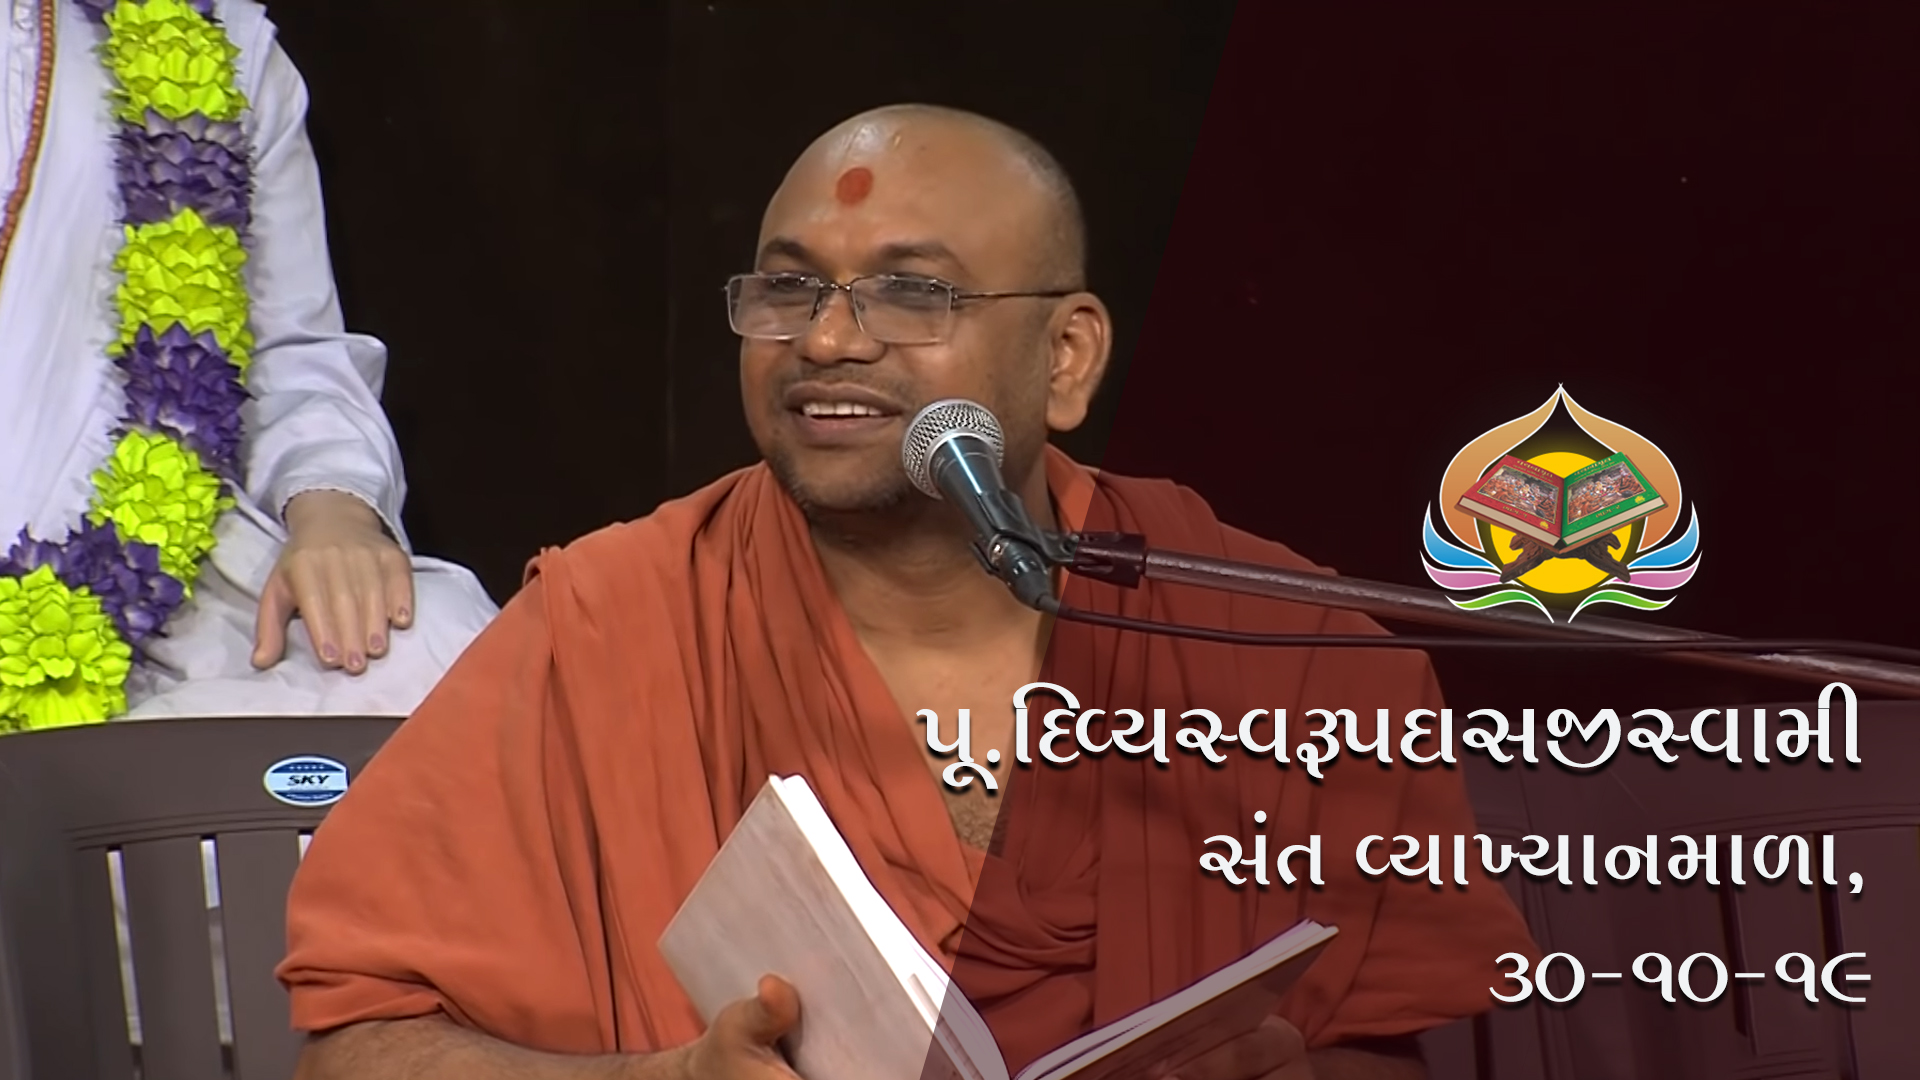 P.Divyaswaroopdasjiswami | Sant Vyakhyan Mala | Vachanamrut Dwishatabdi Mahotsav & Gyansatra 13